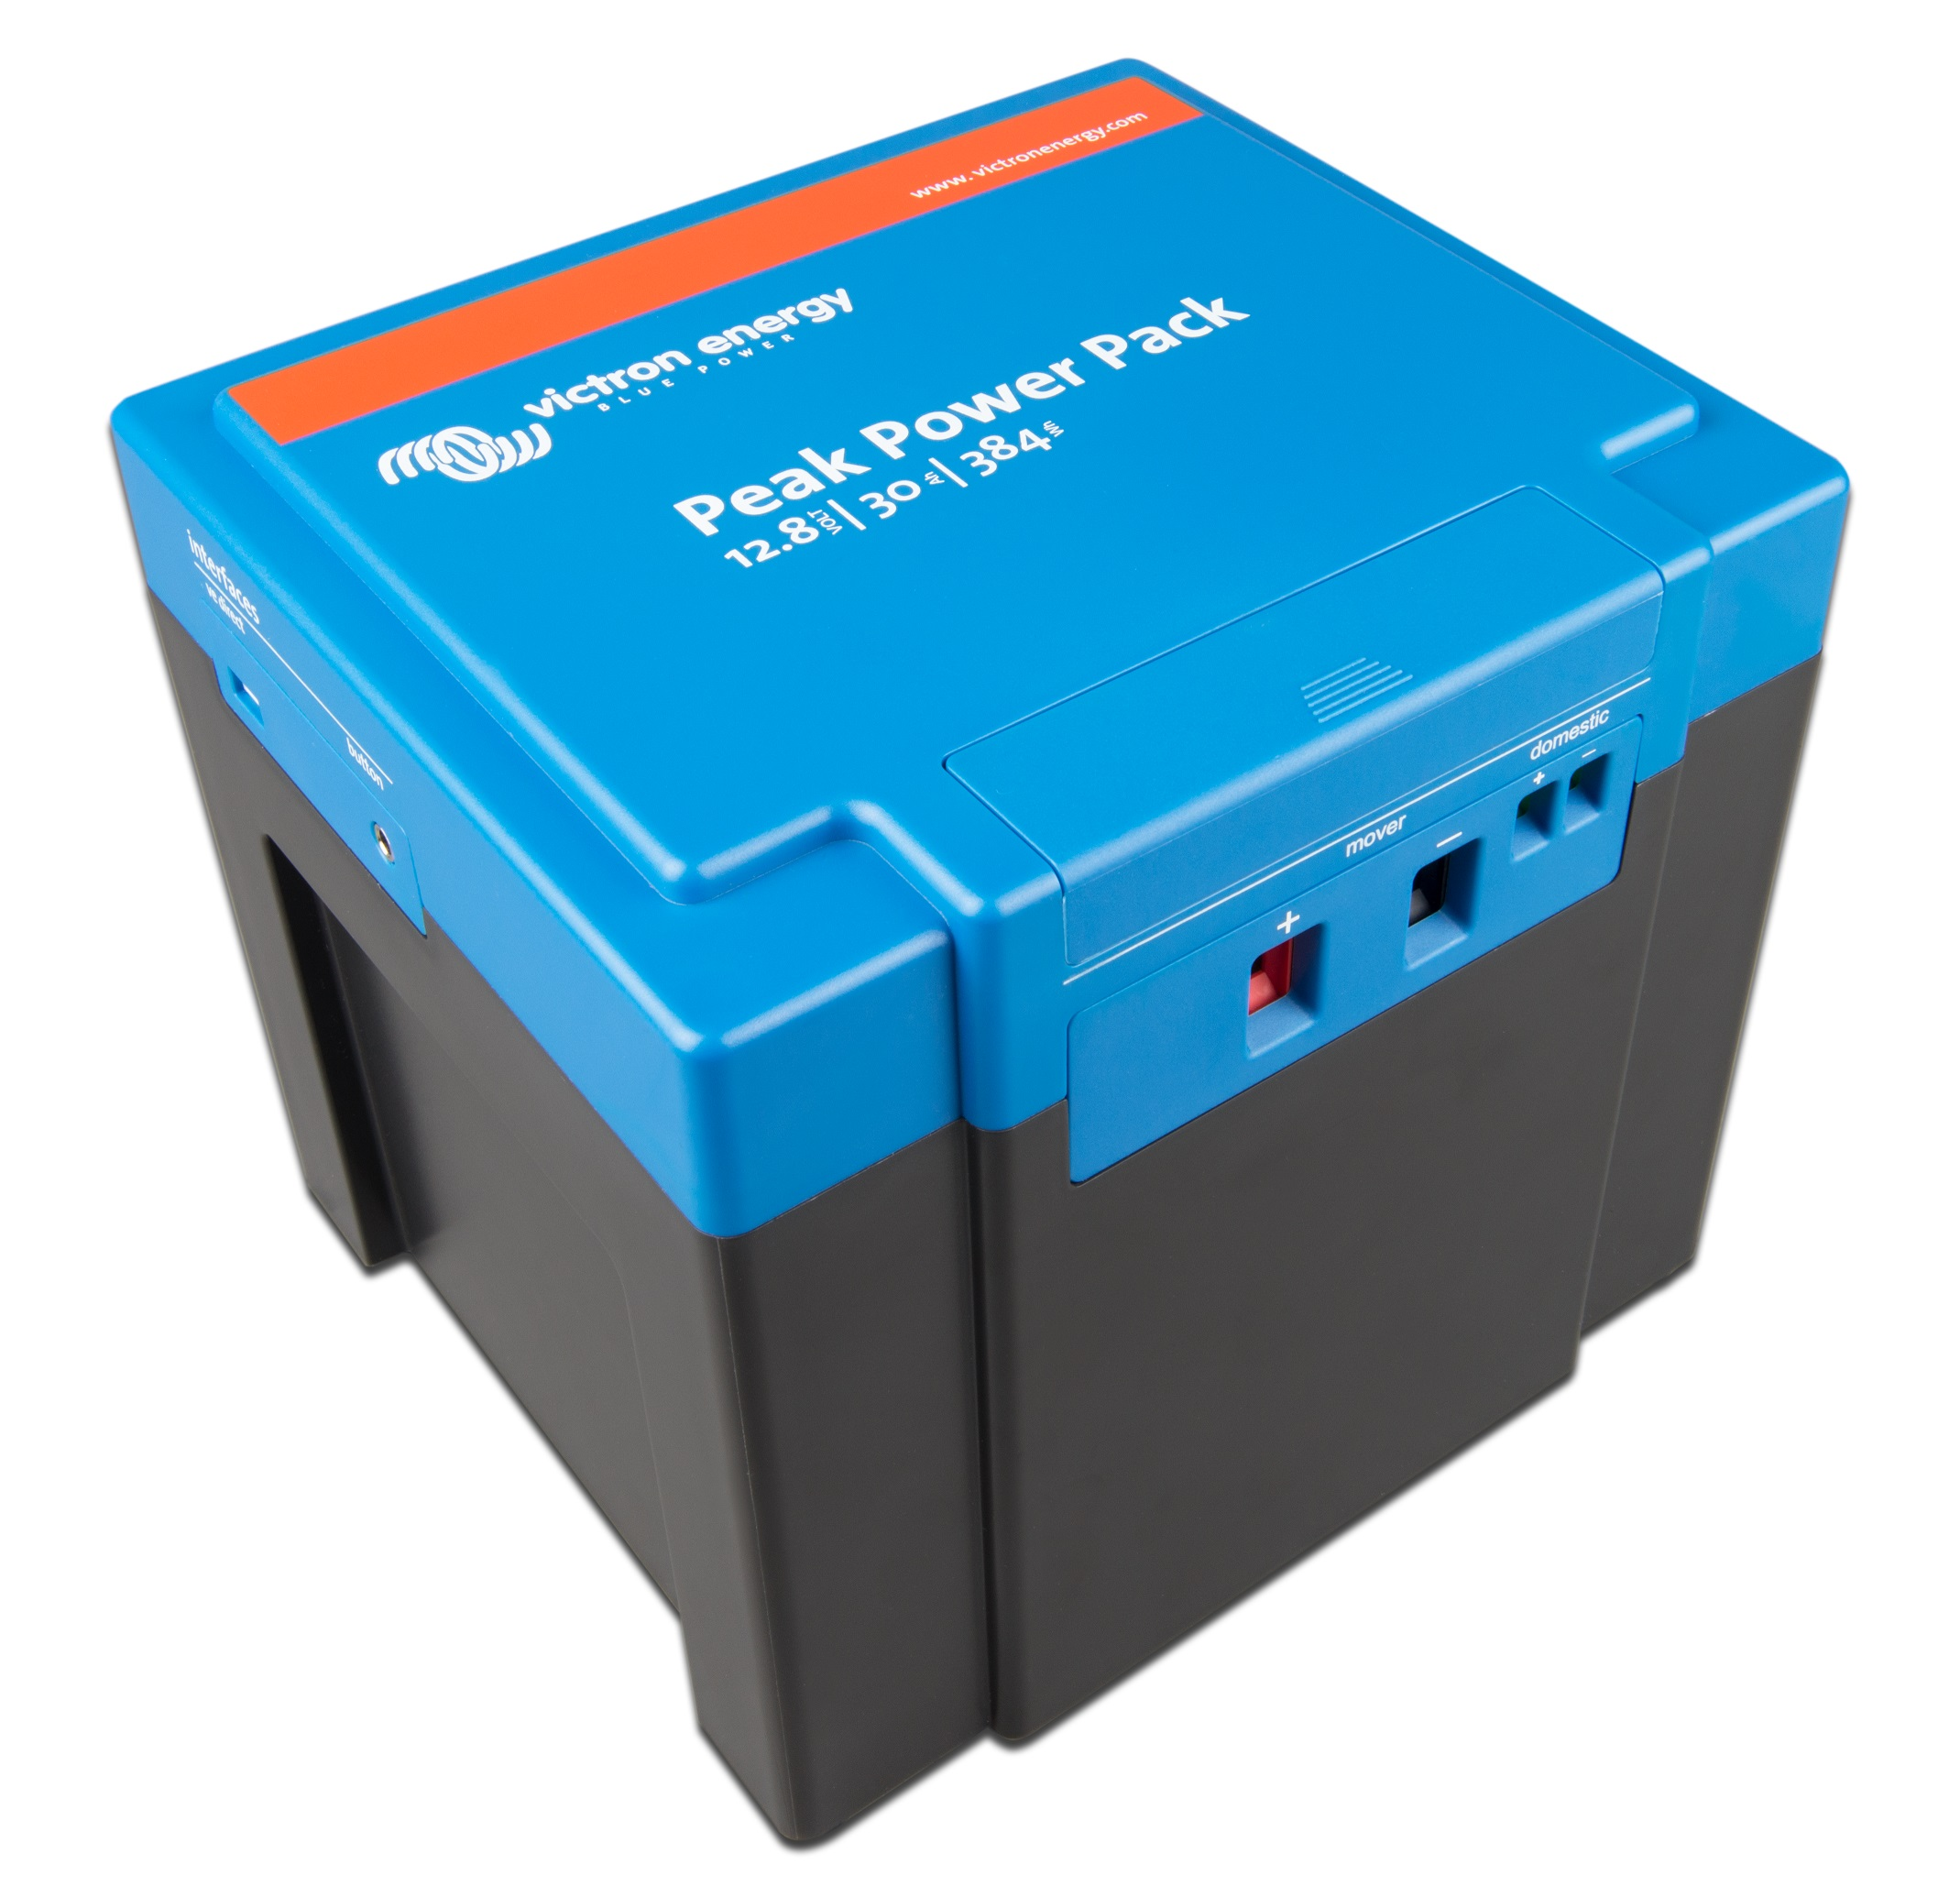 PEAK POWER PACK 12,8V/8AH - 102WH - VICTRON ENERGY